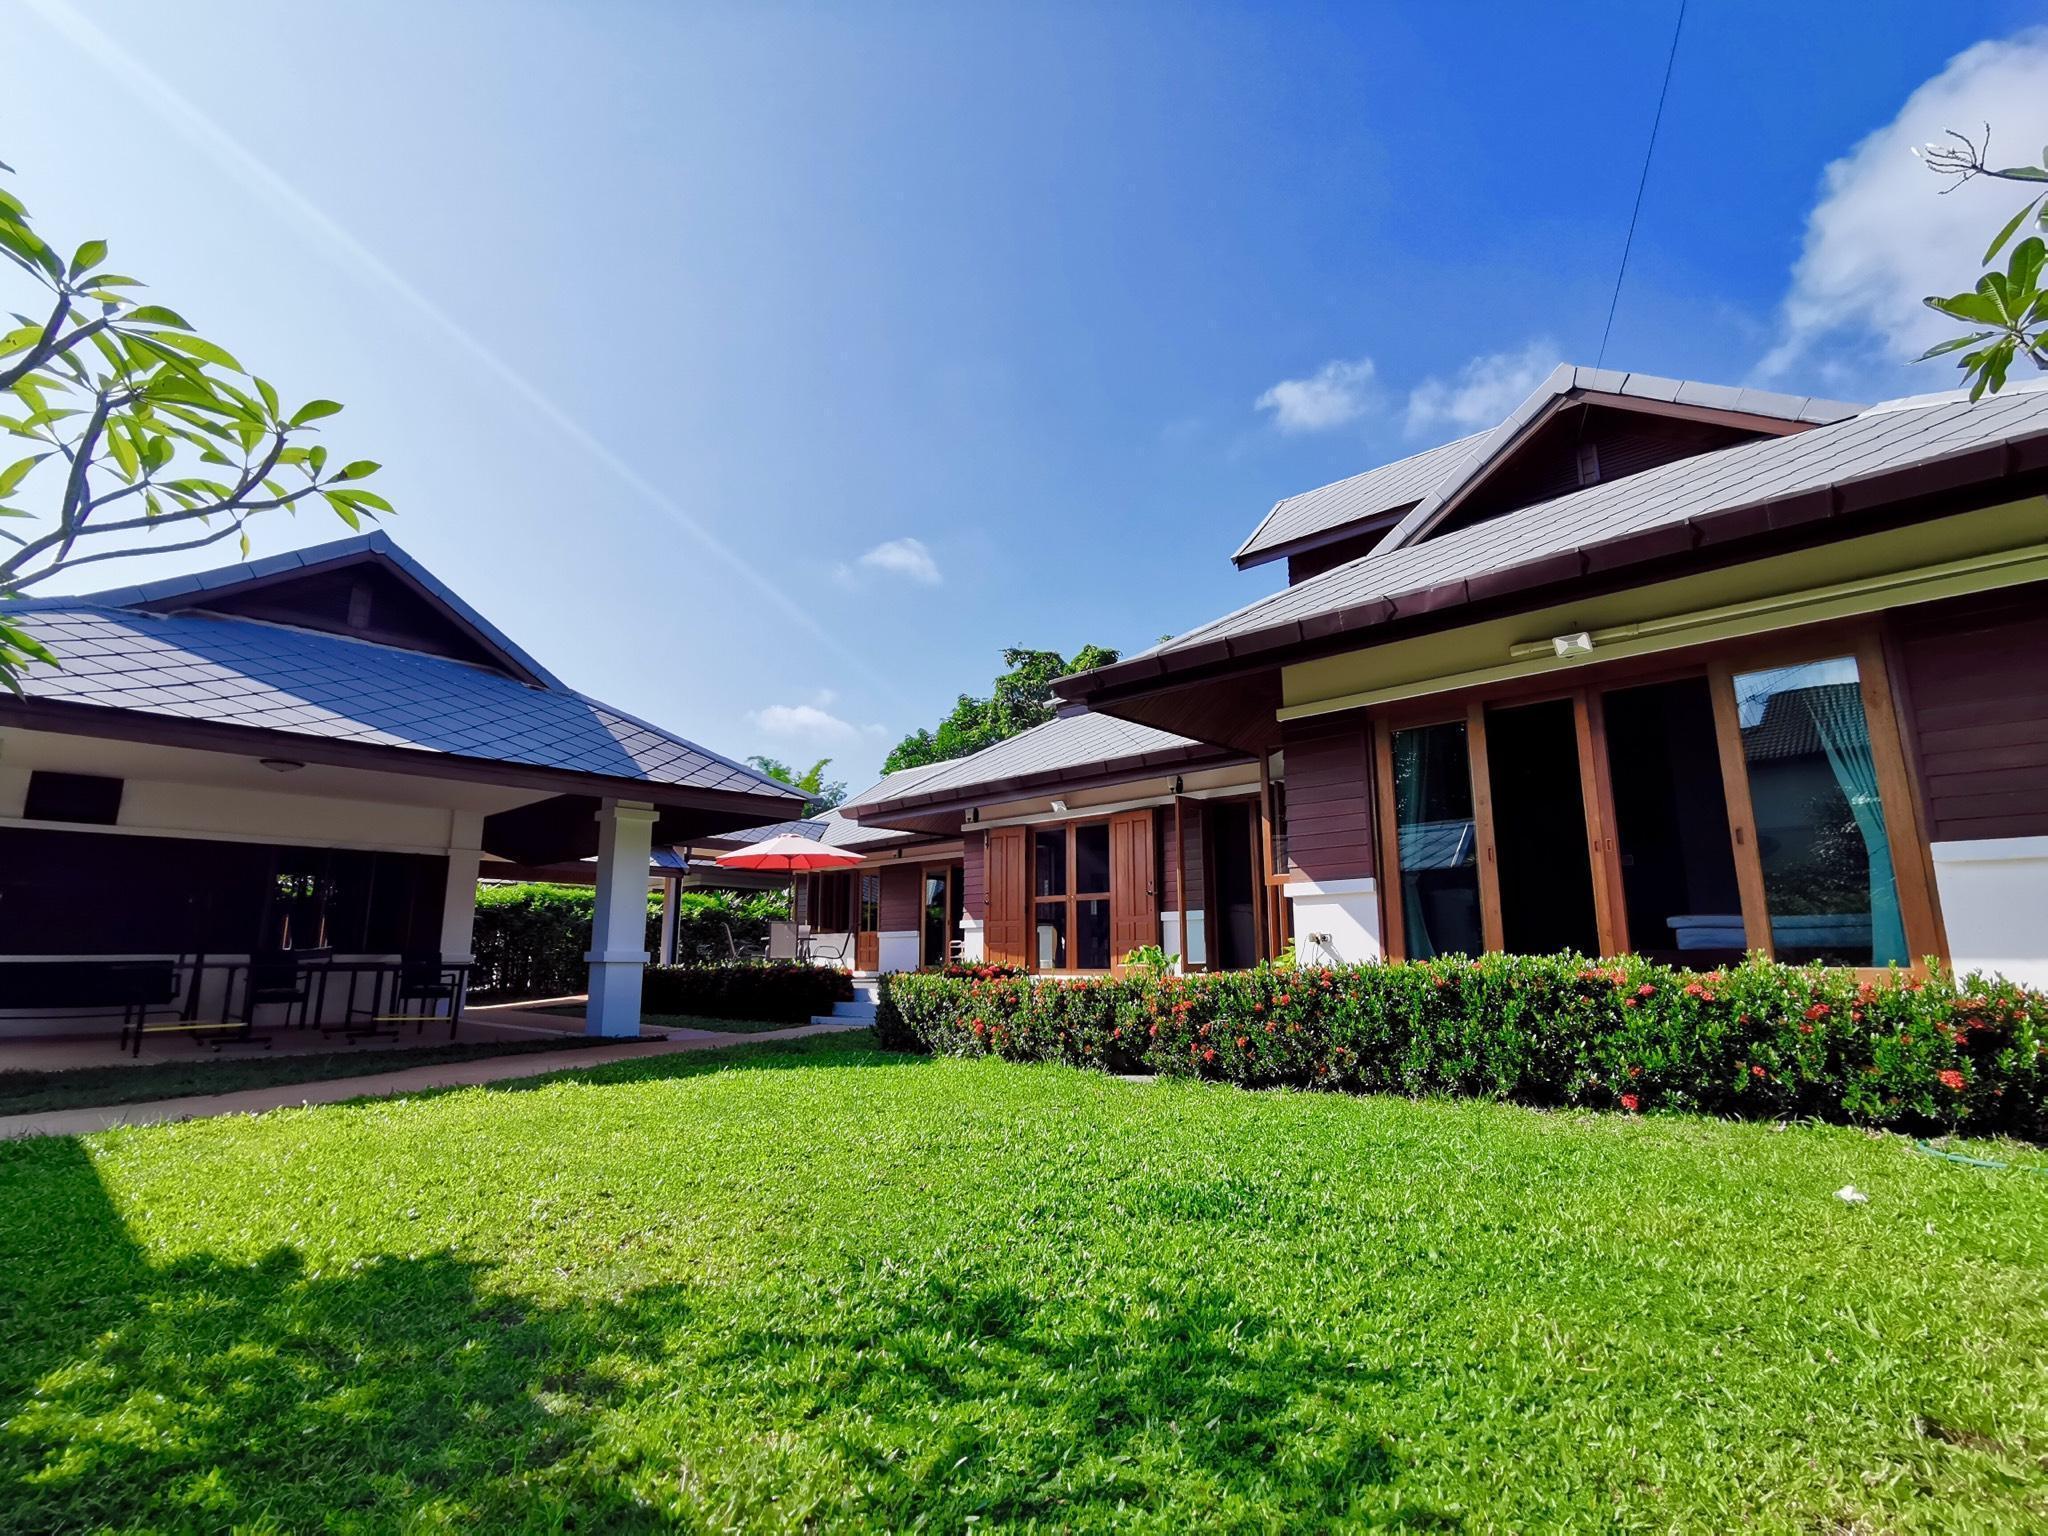 Chiangmai Jhai Yen Yen อพาร์ตเมนต์ 4 ห้องนอน 5 ห้องน้ำส่วนตัว ขนาด 800 ตร.ม. – แม่ริม